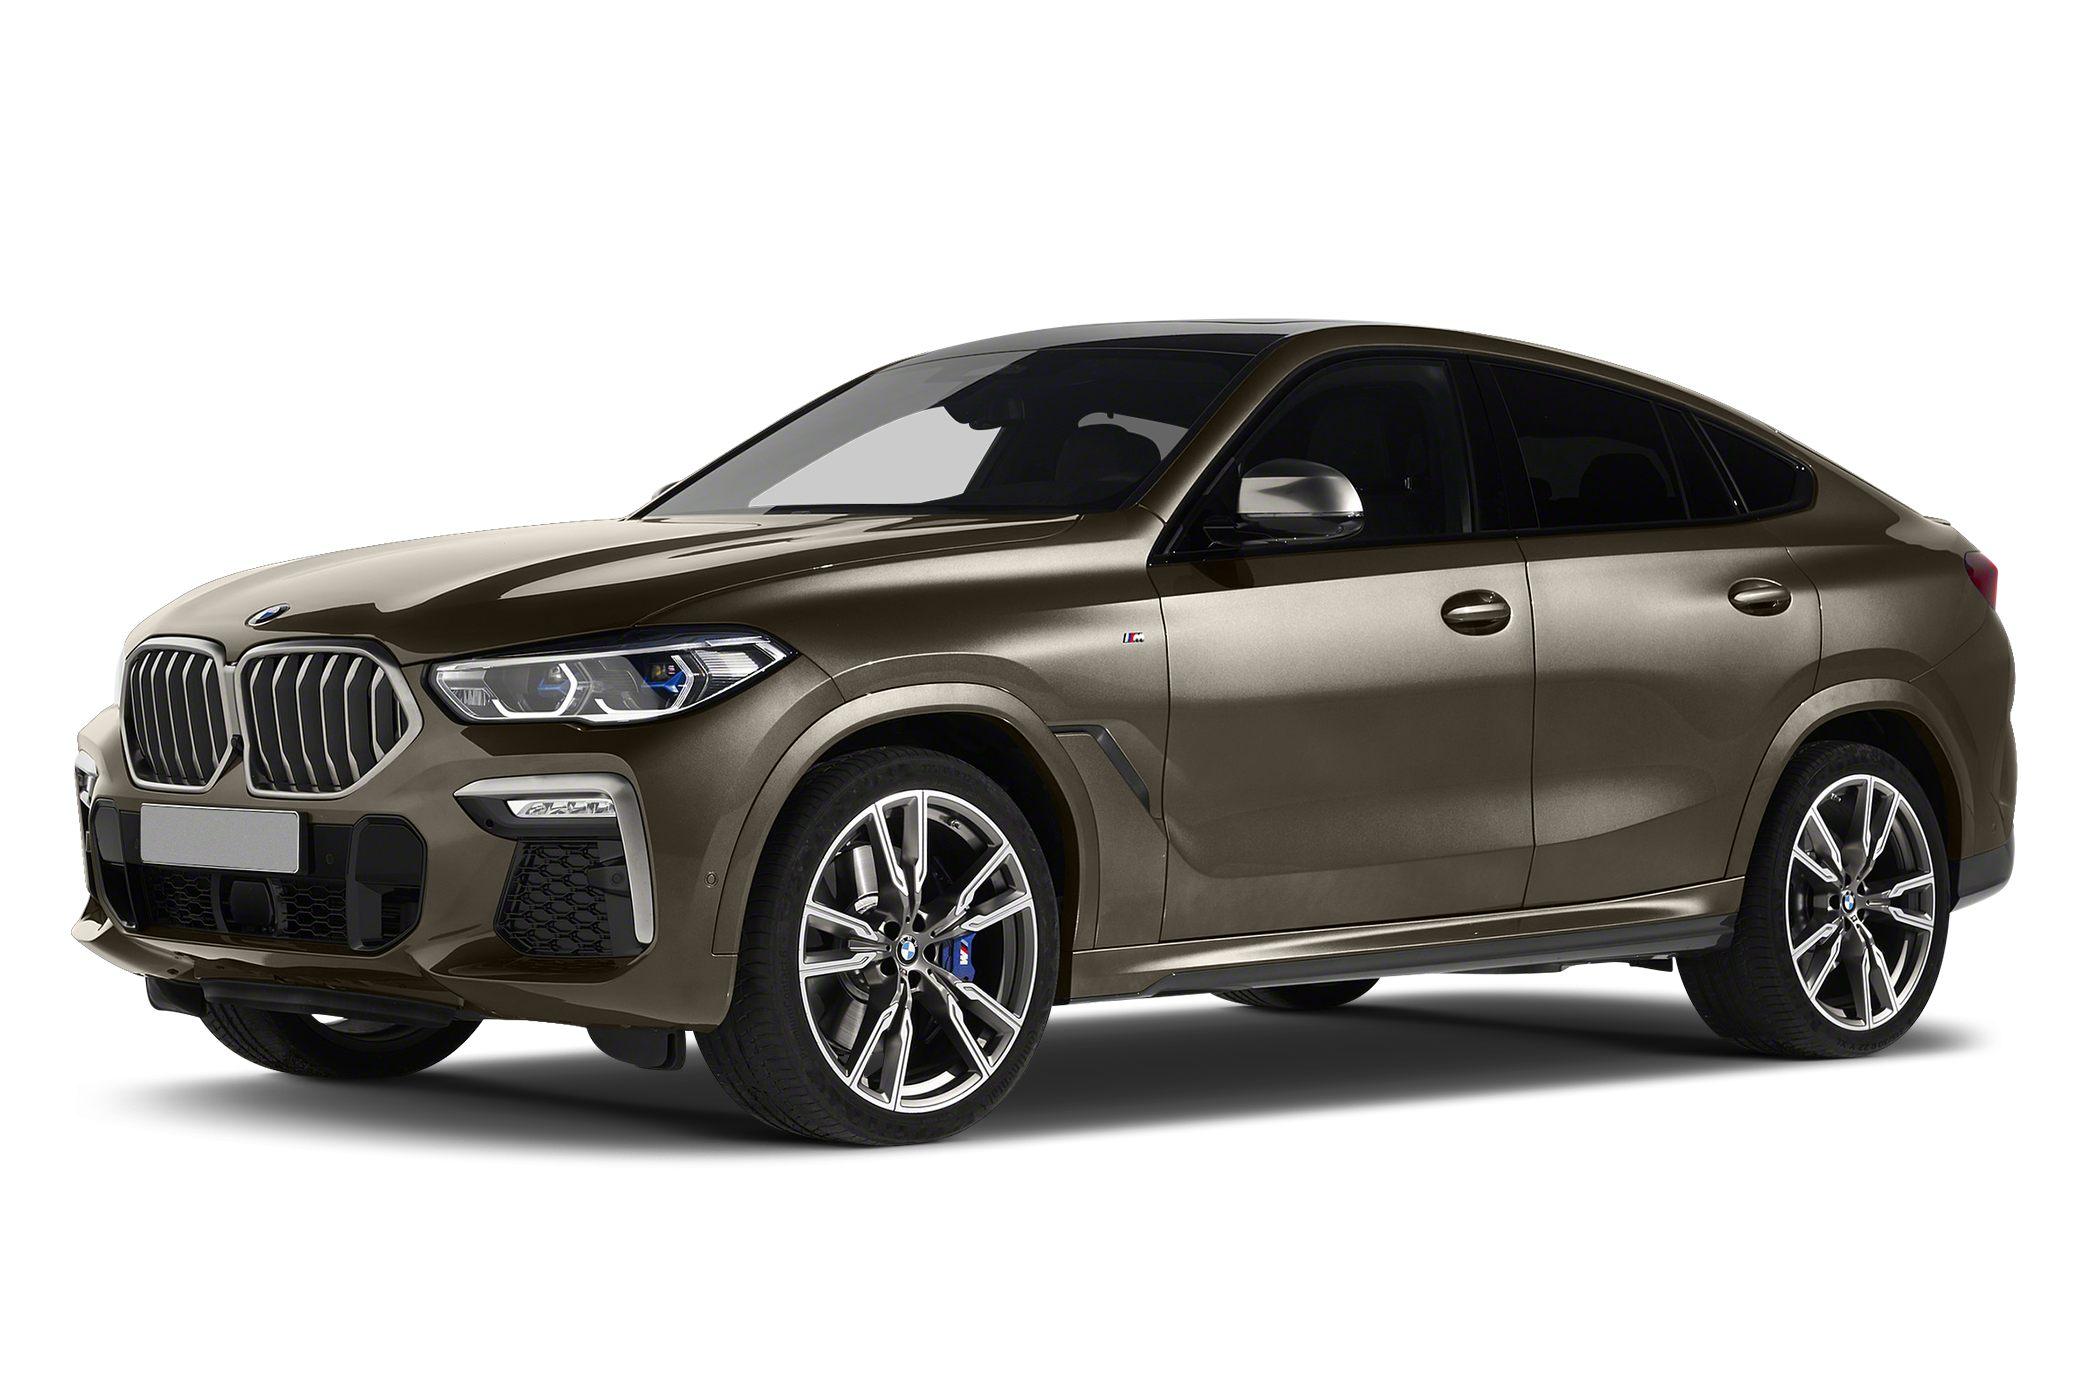 2020 BMW X6 Vantablack concept headed to 2019 Frankfurt ...